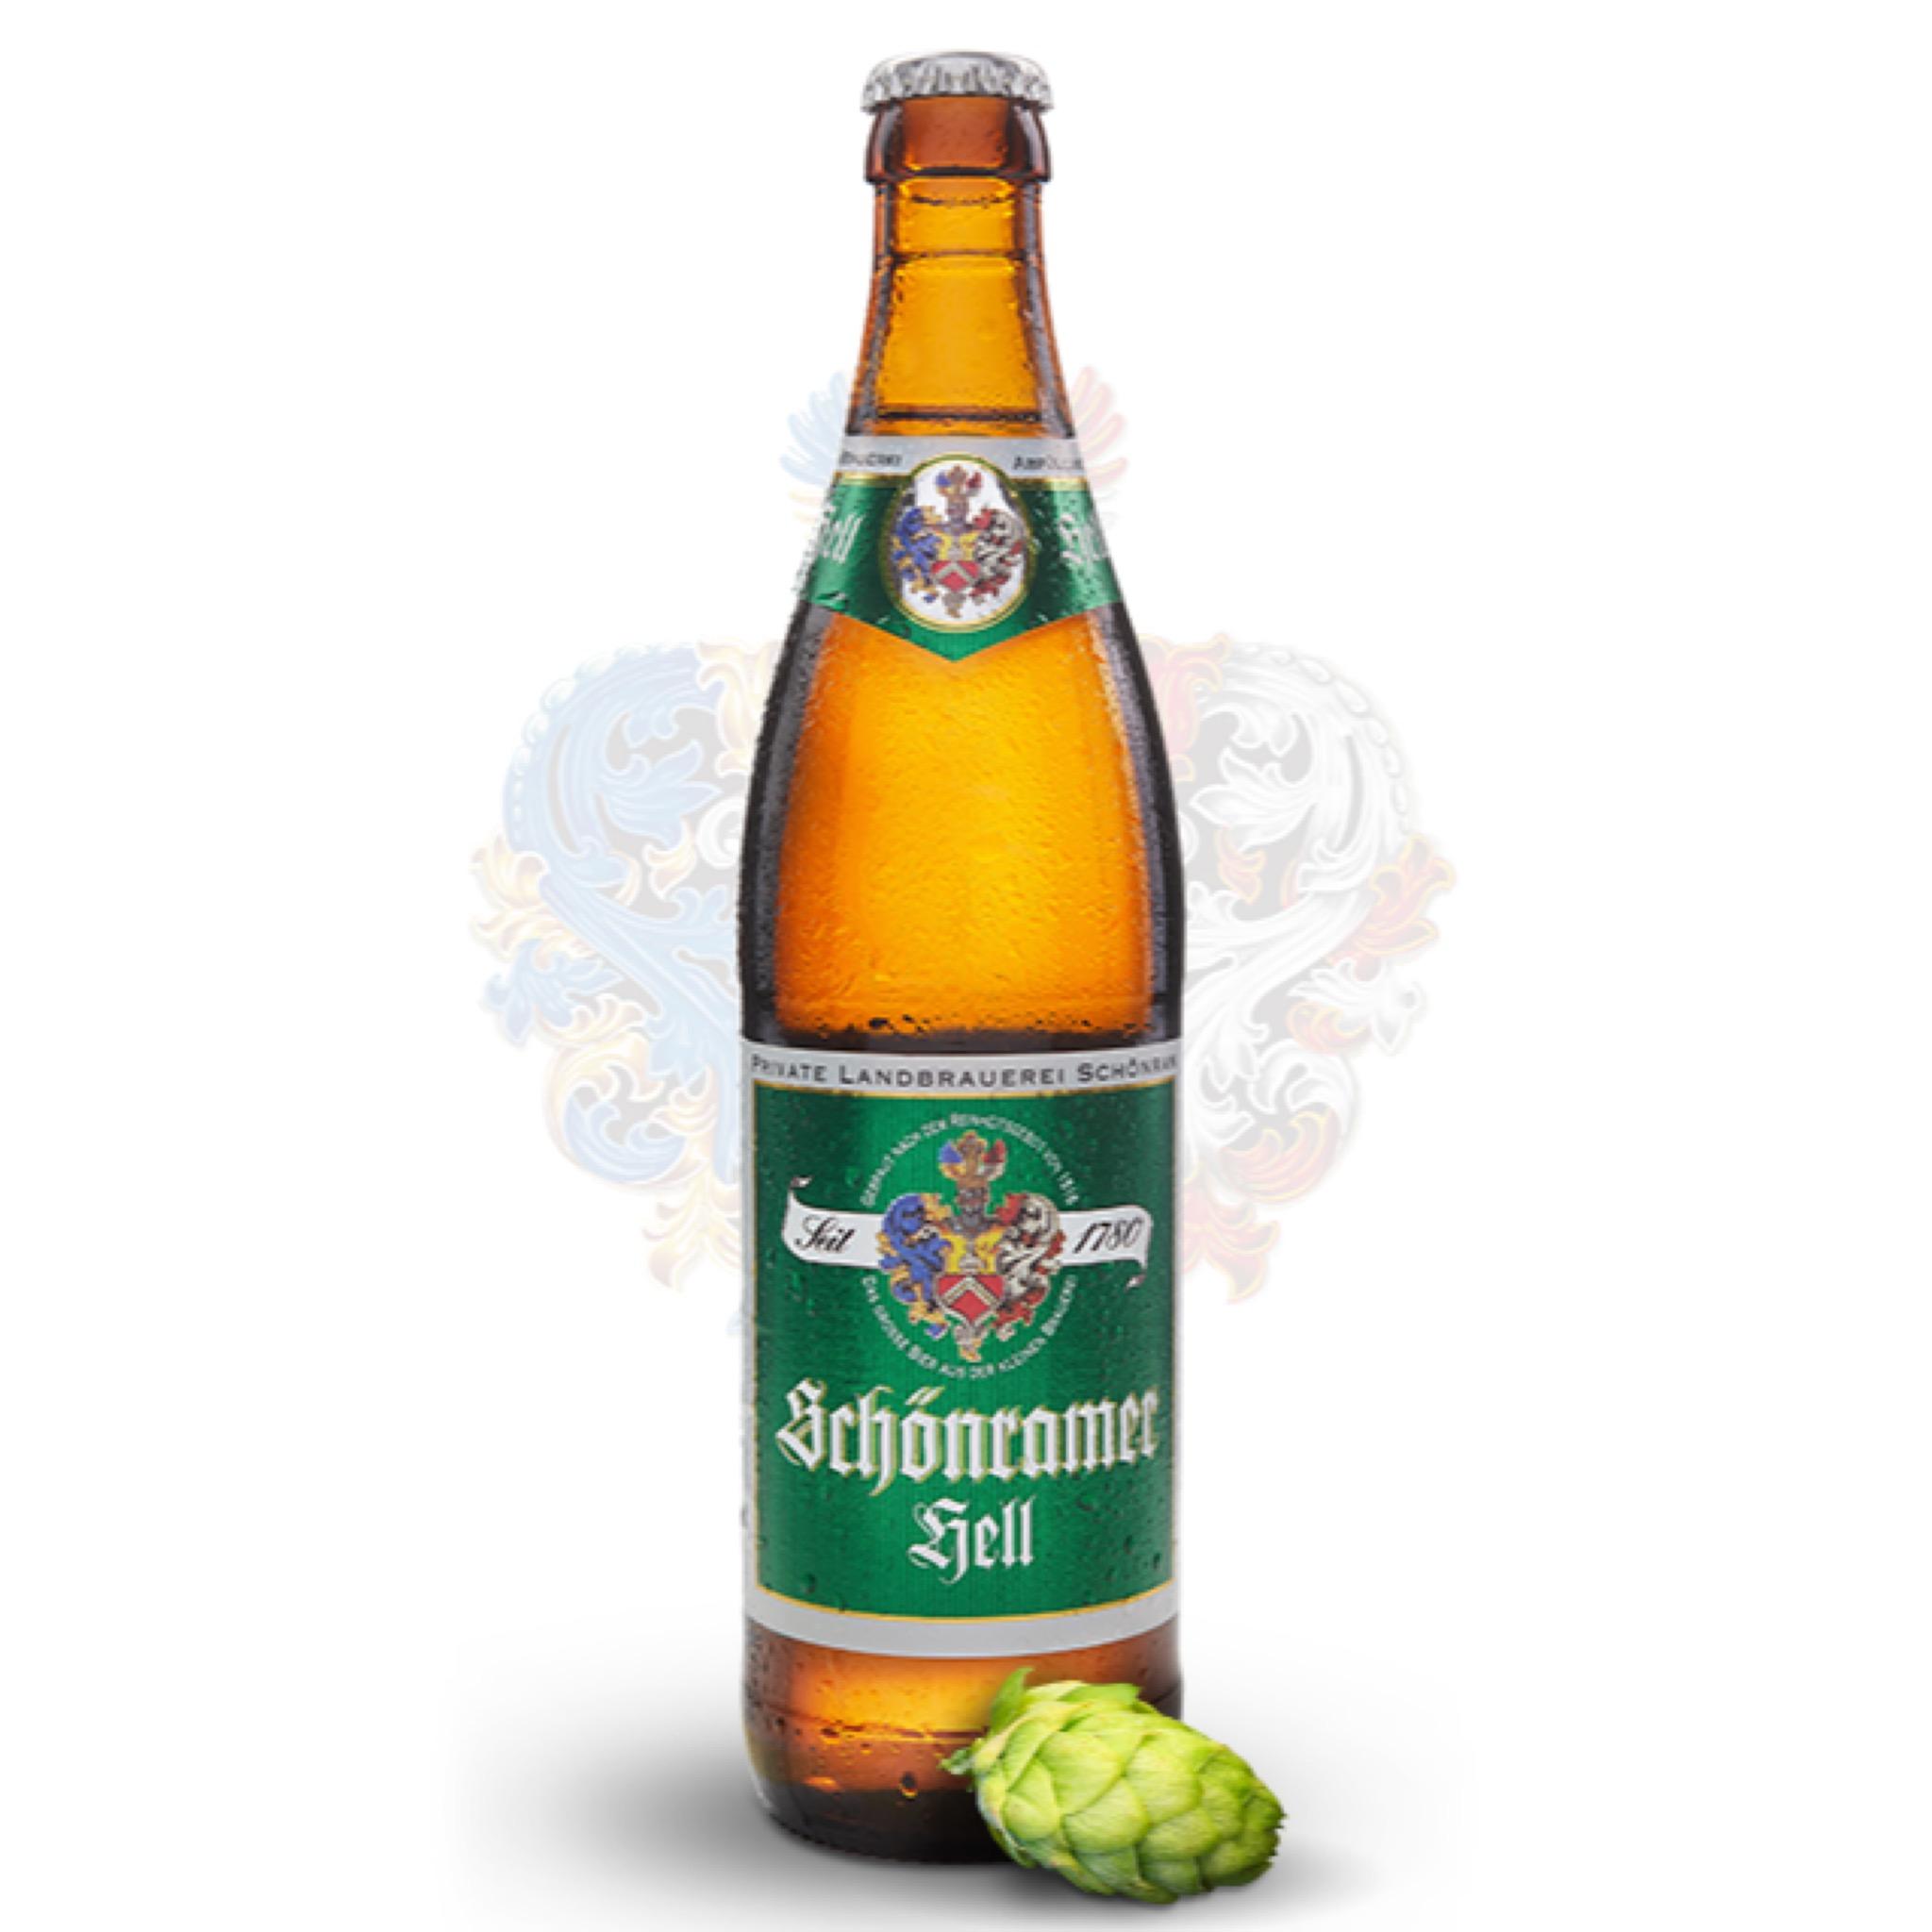 Schönramer Hell 5% 500ml